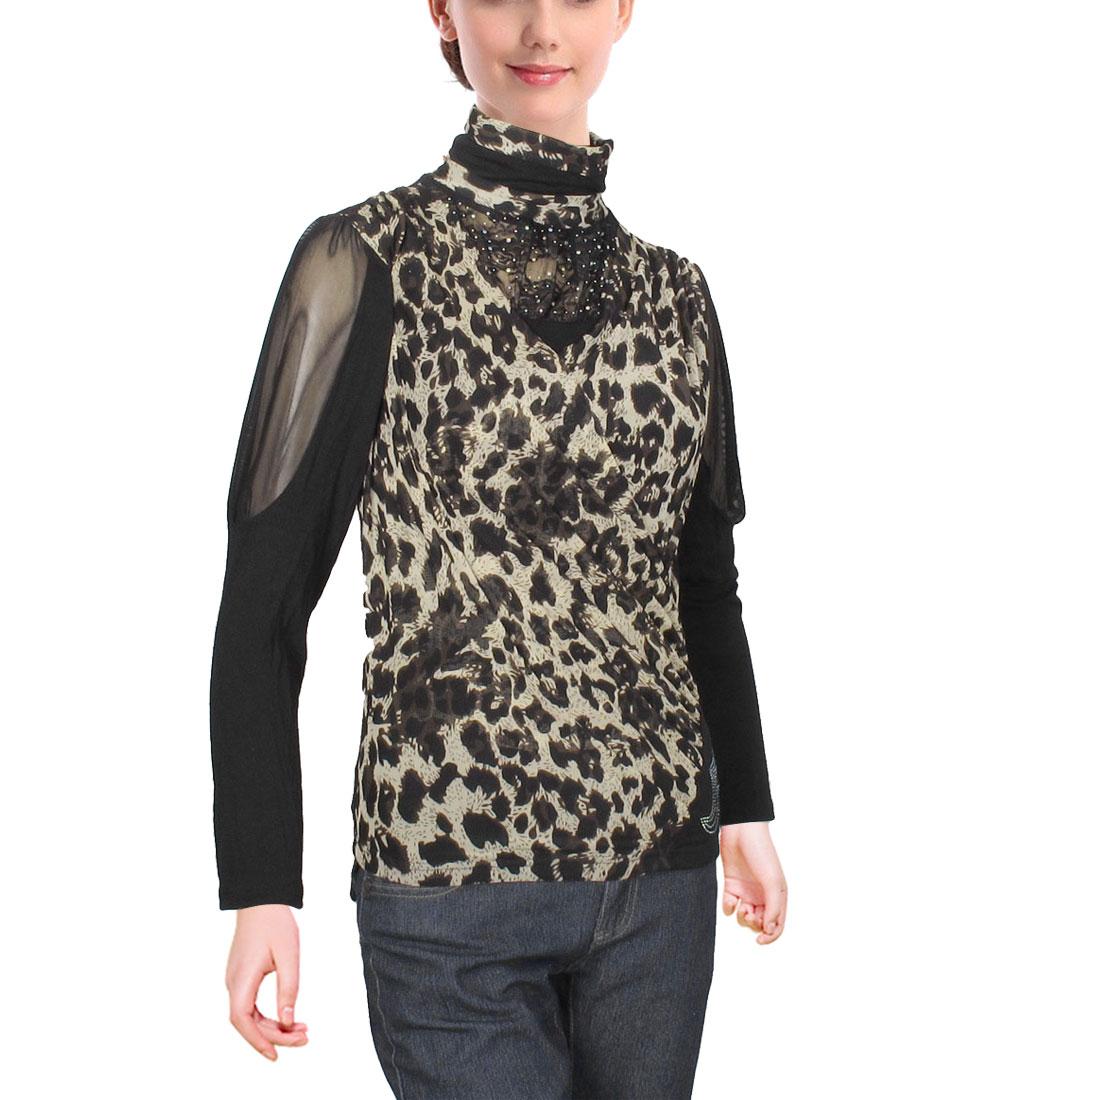 Leopard Pattern Rhinestone Detail Pullover Shirt Tops Black for Ladies XS